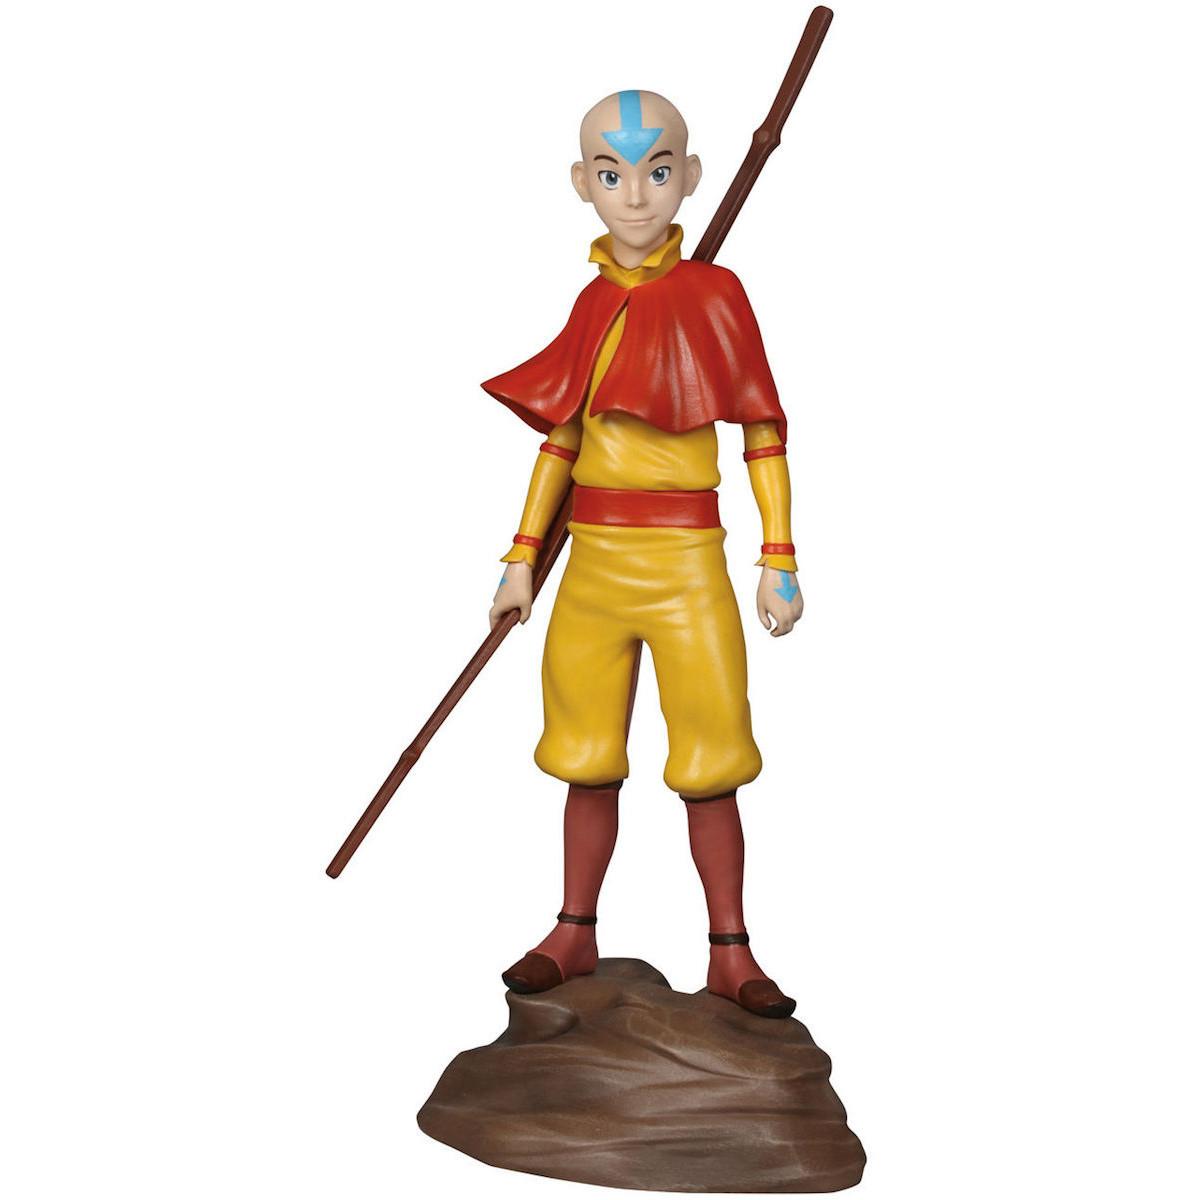 Avatar Aang: Avatar: The Last Airbender Aang Statue